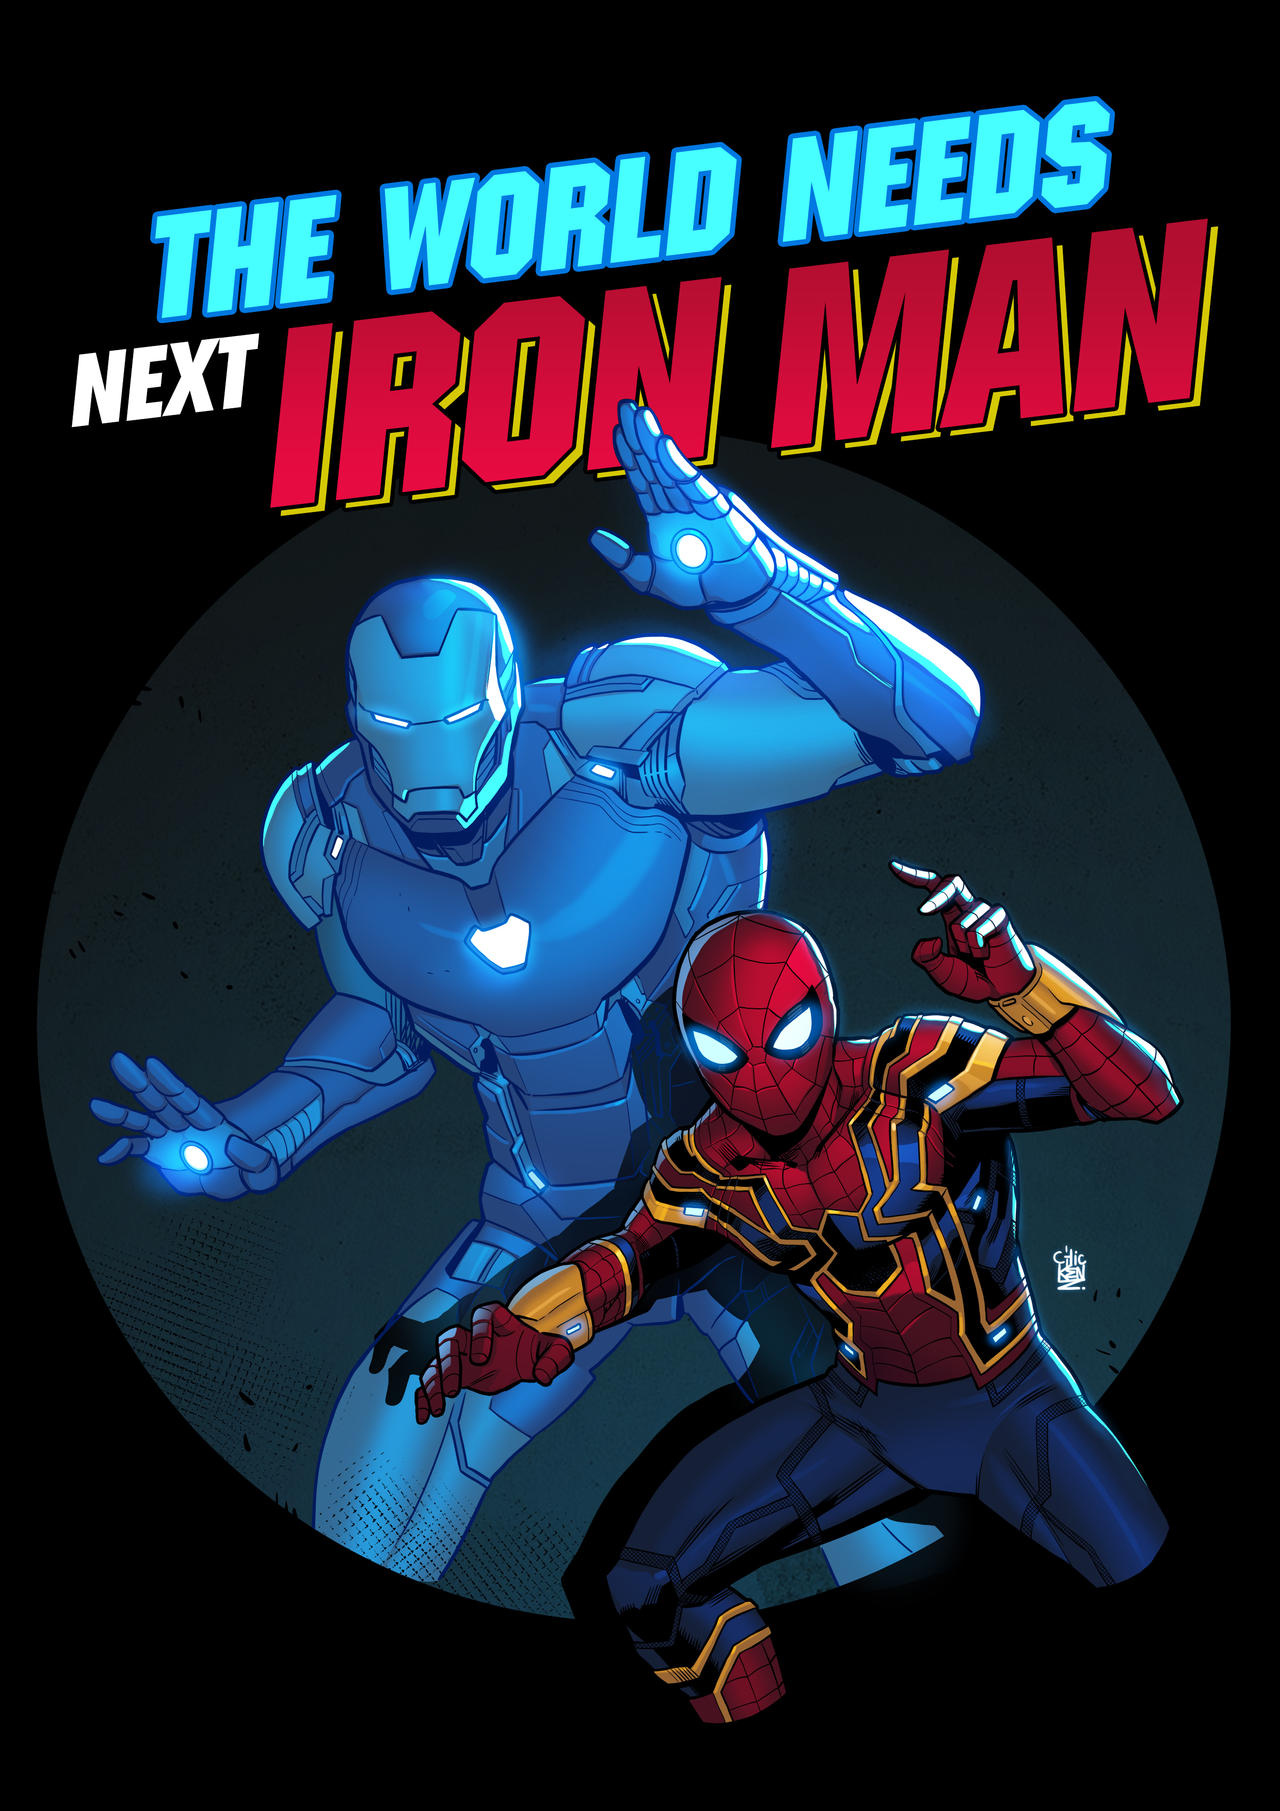 The World Needs Next Iron man